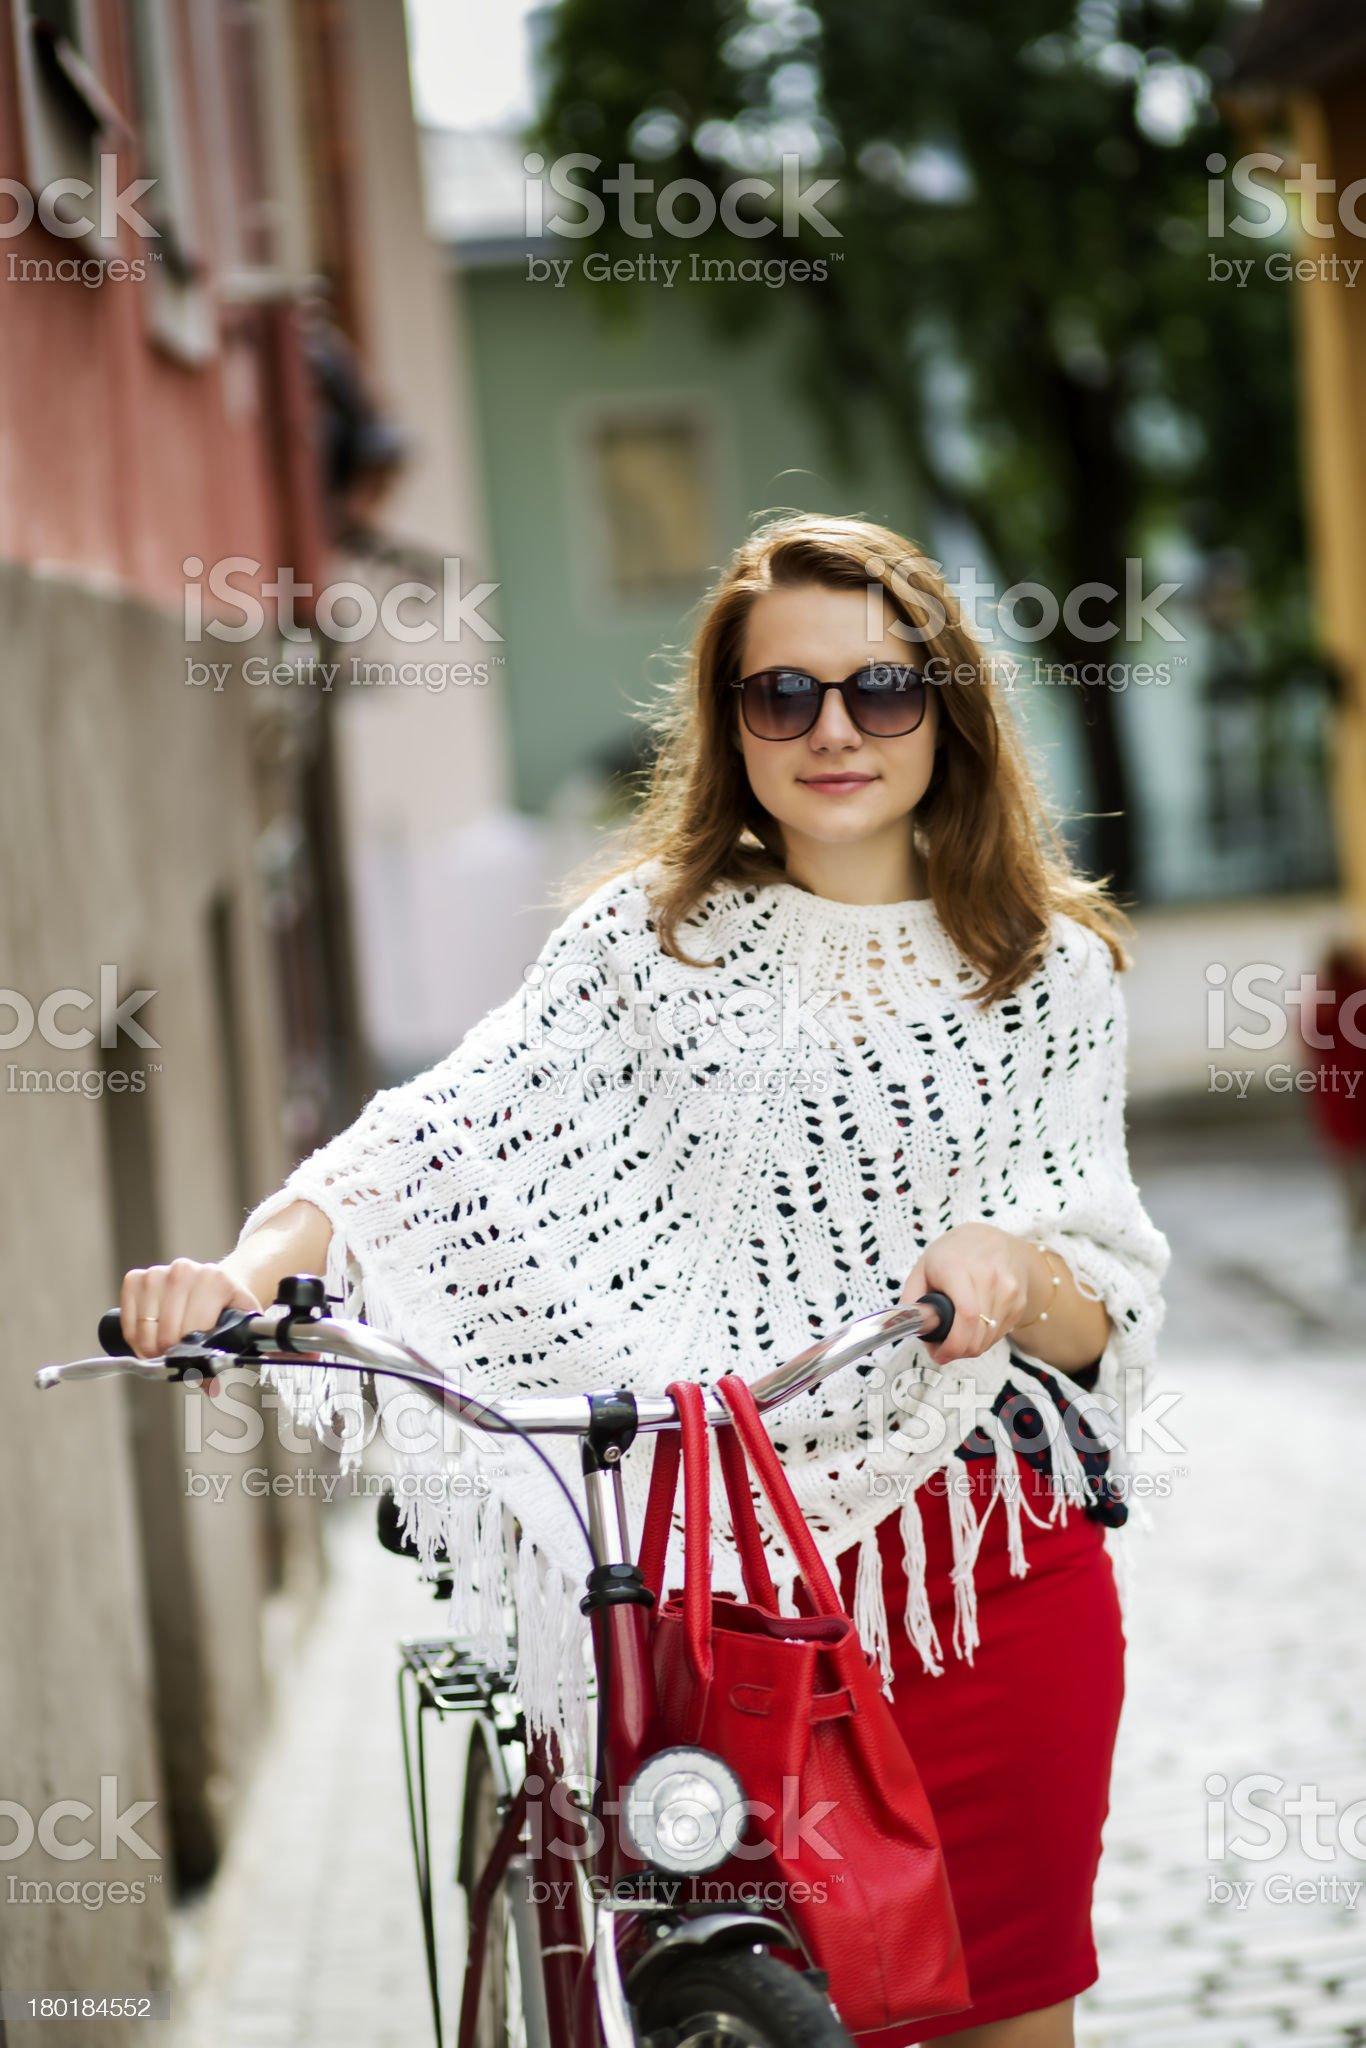 Zoomed happy woman on city street royalty-free stock photo